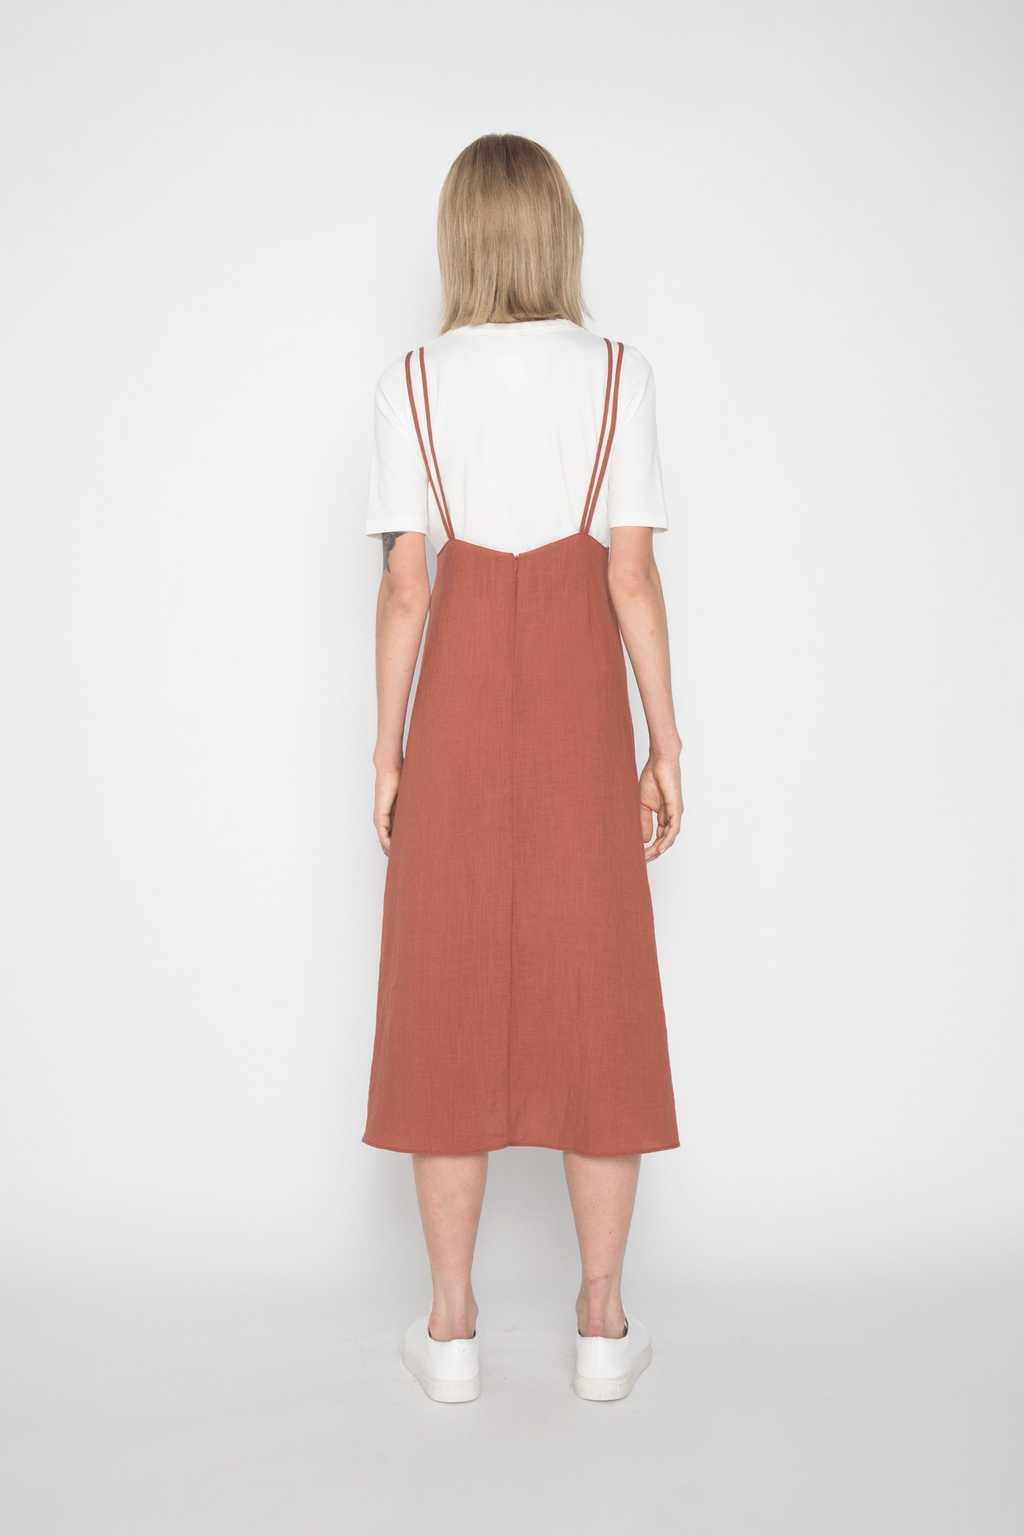 Dress H185 Brown 4